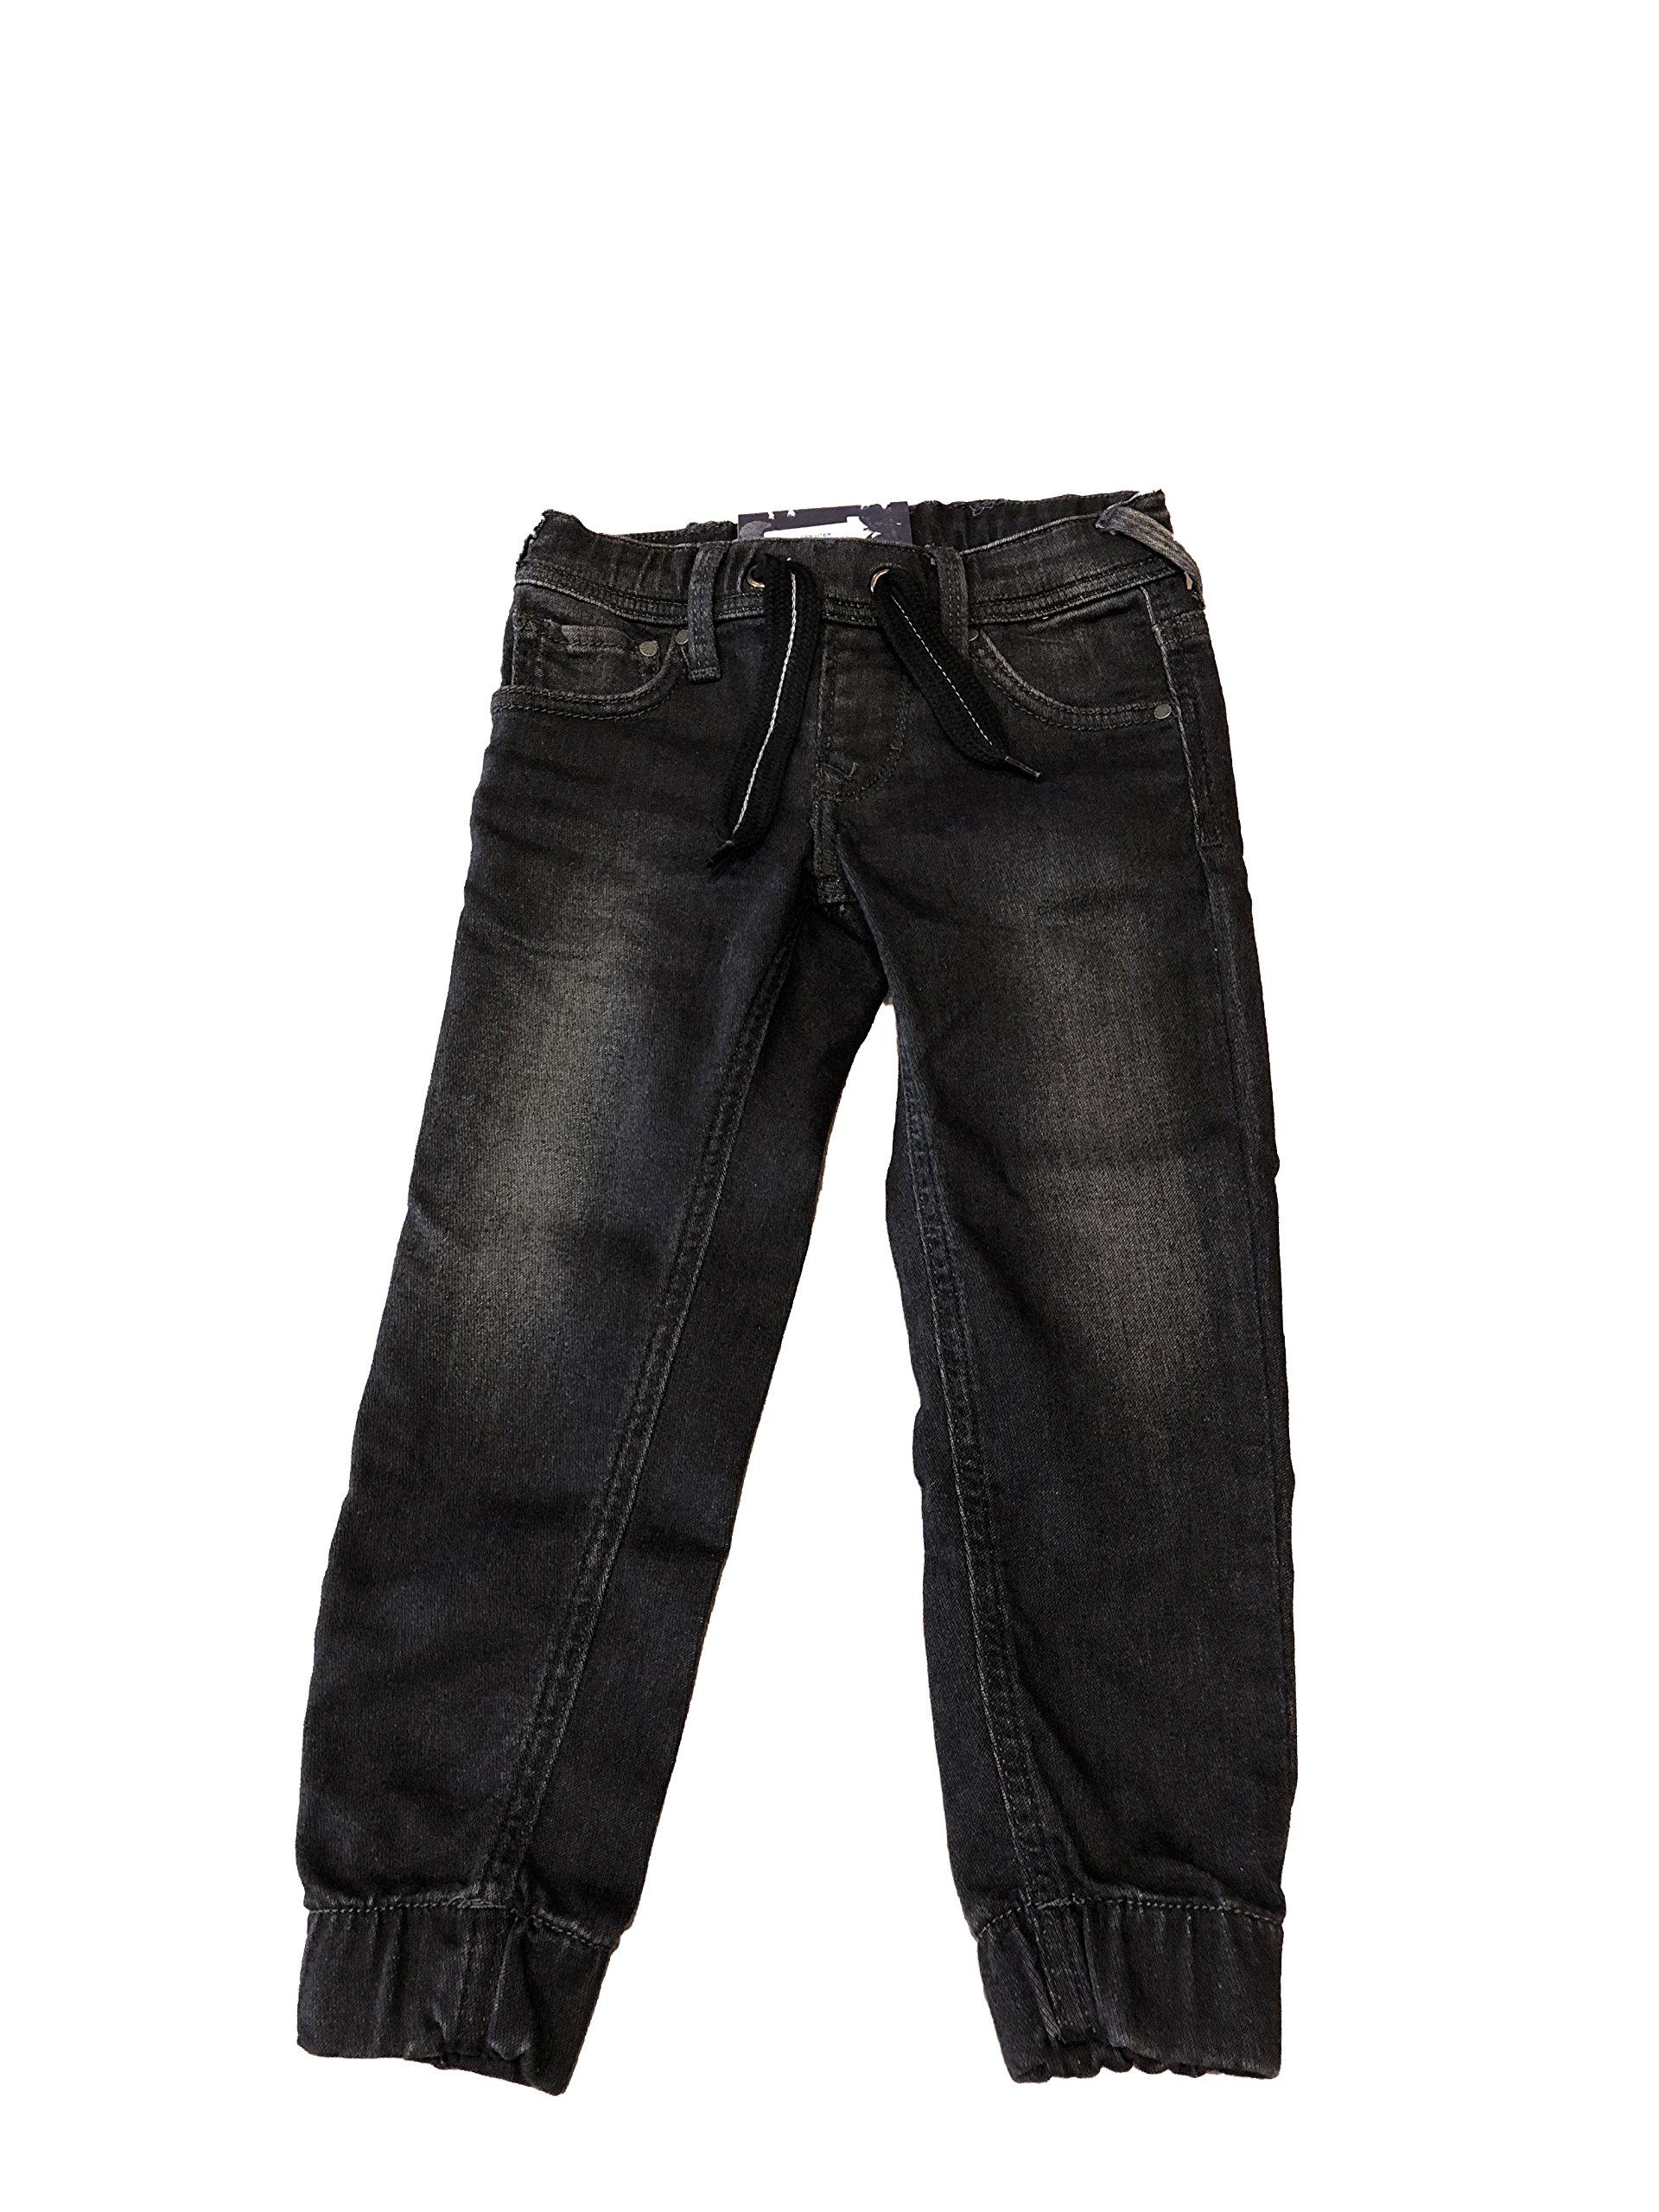 Pepe Jeans – Pantalones- Taper- Sprinter- Negros